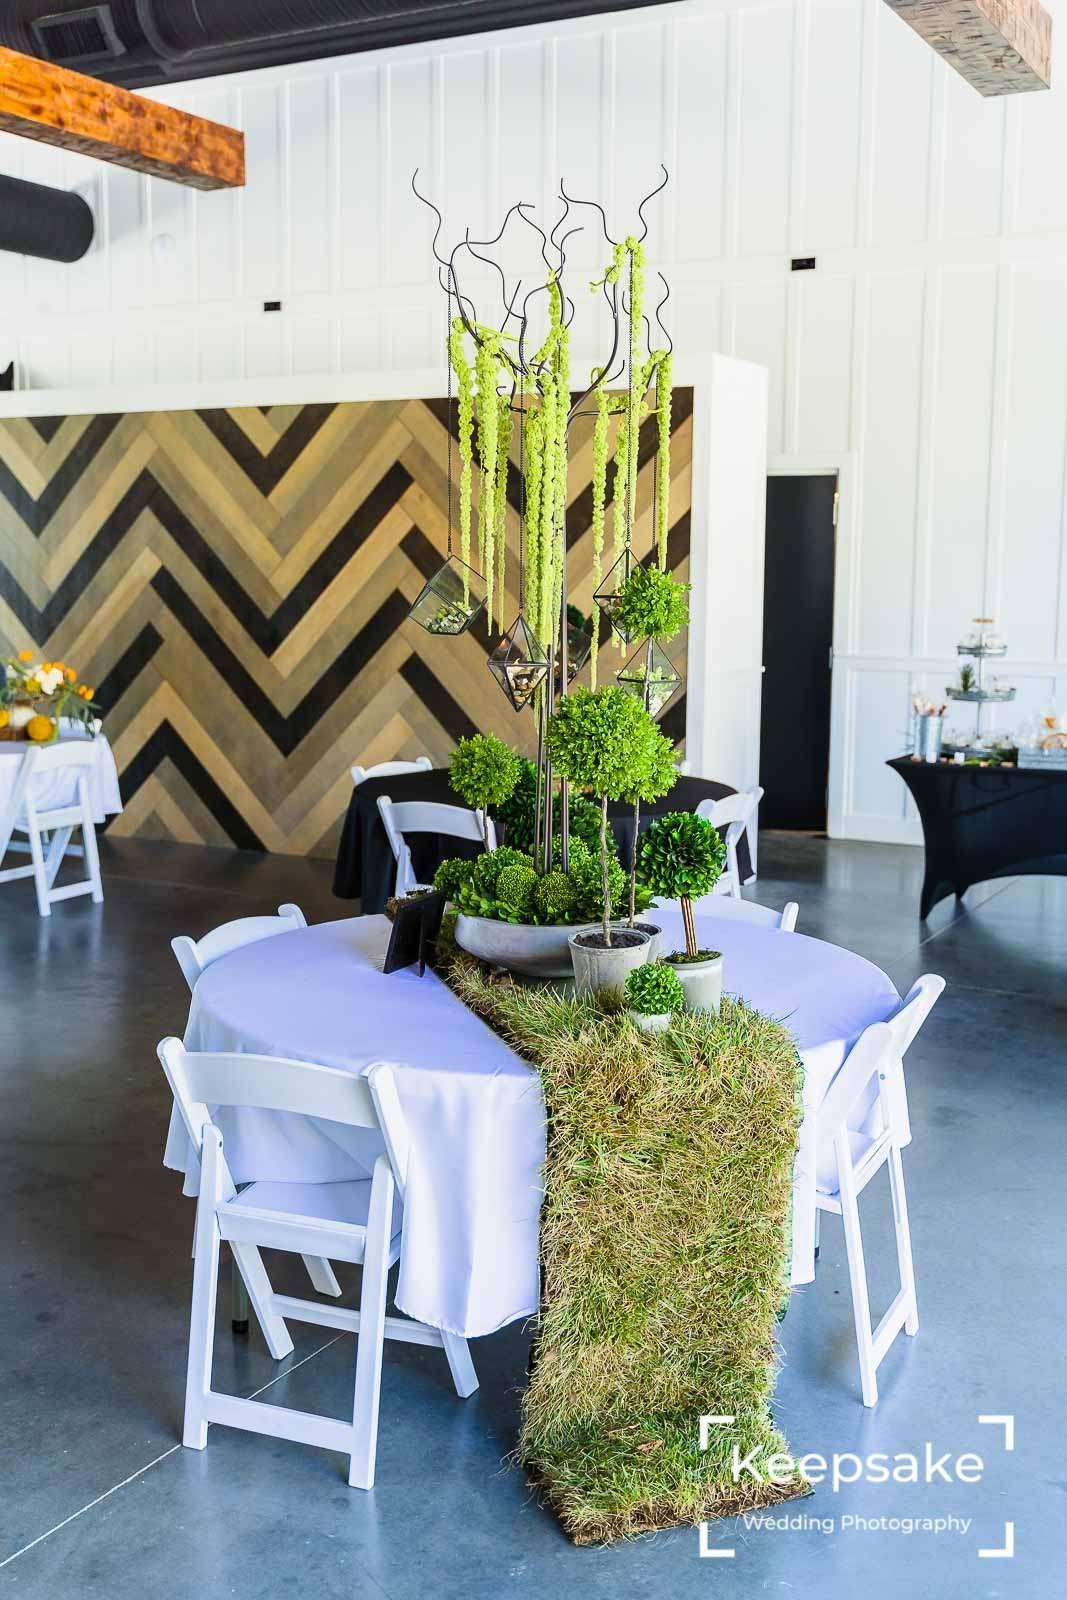 The Event Barn at Mahr Park Arboretum Open House - Keepsake Wedding Photography-10